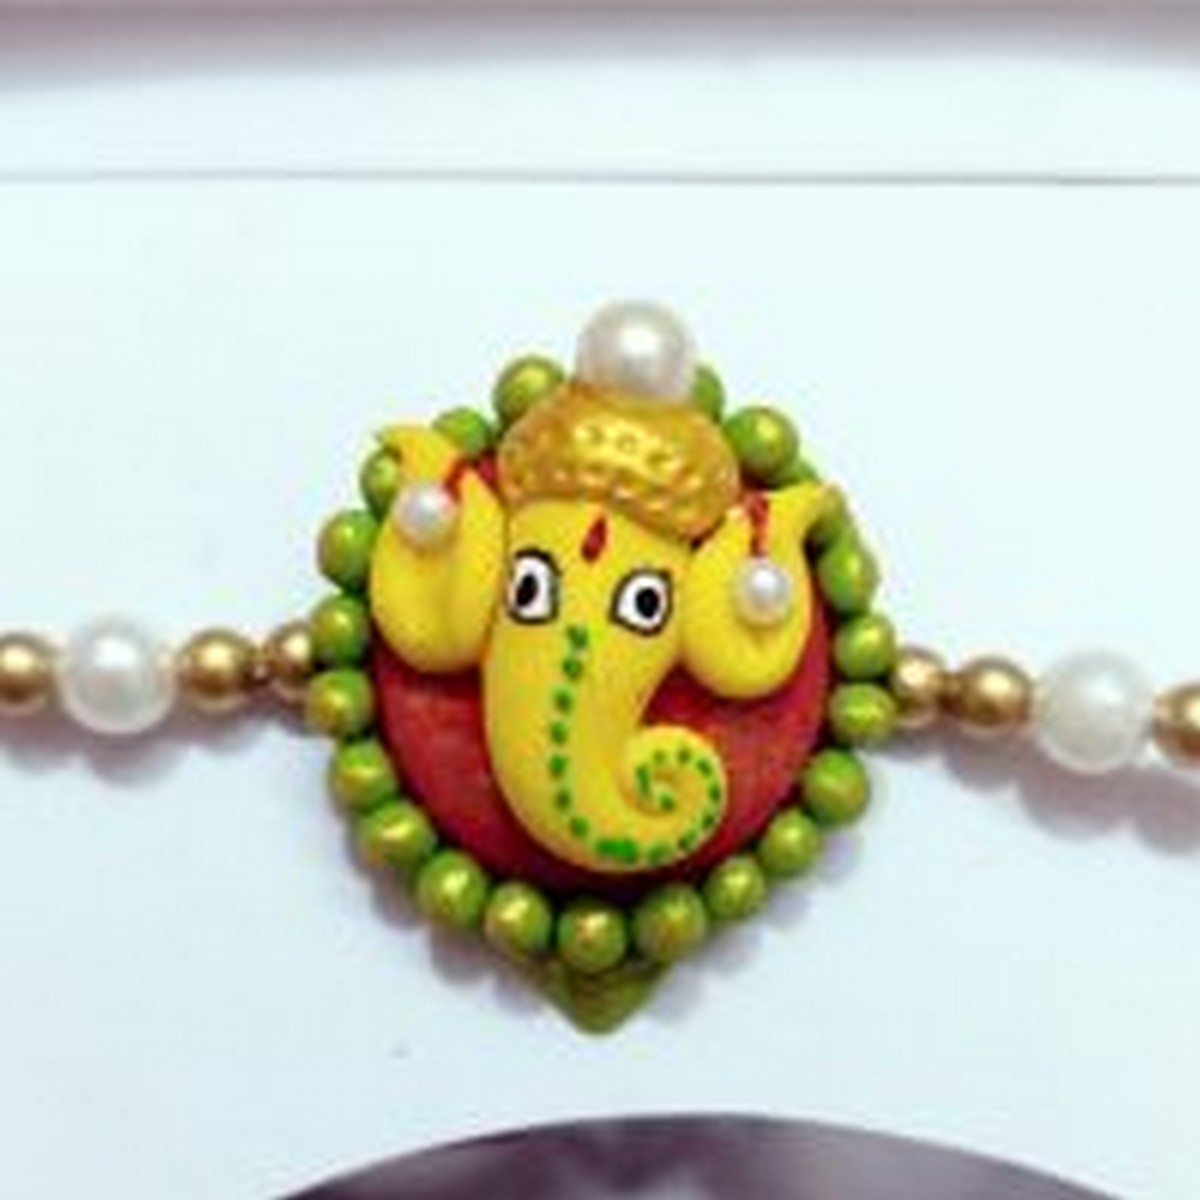 Beautiful Handmade Ganesha Rakhi For Your Brother  Beautiful handmade ganesha rakhi for your brother